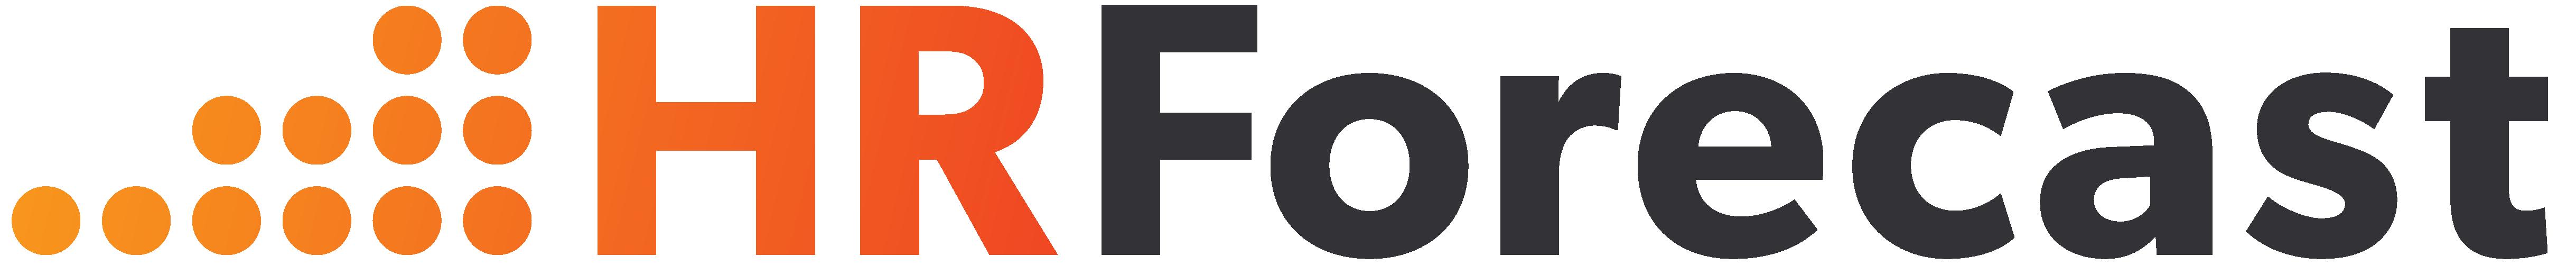 LogoHRForecast